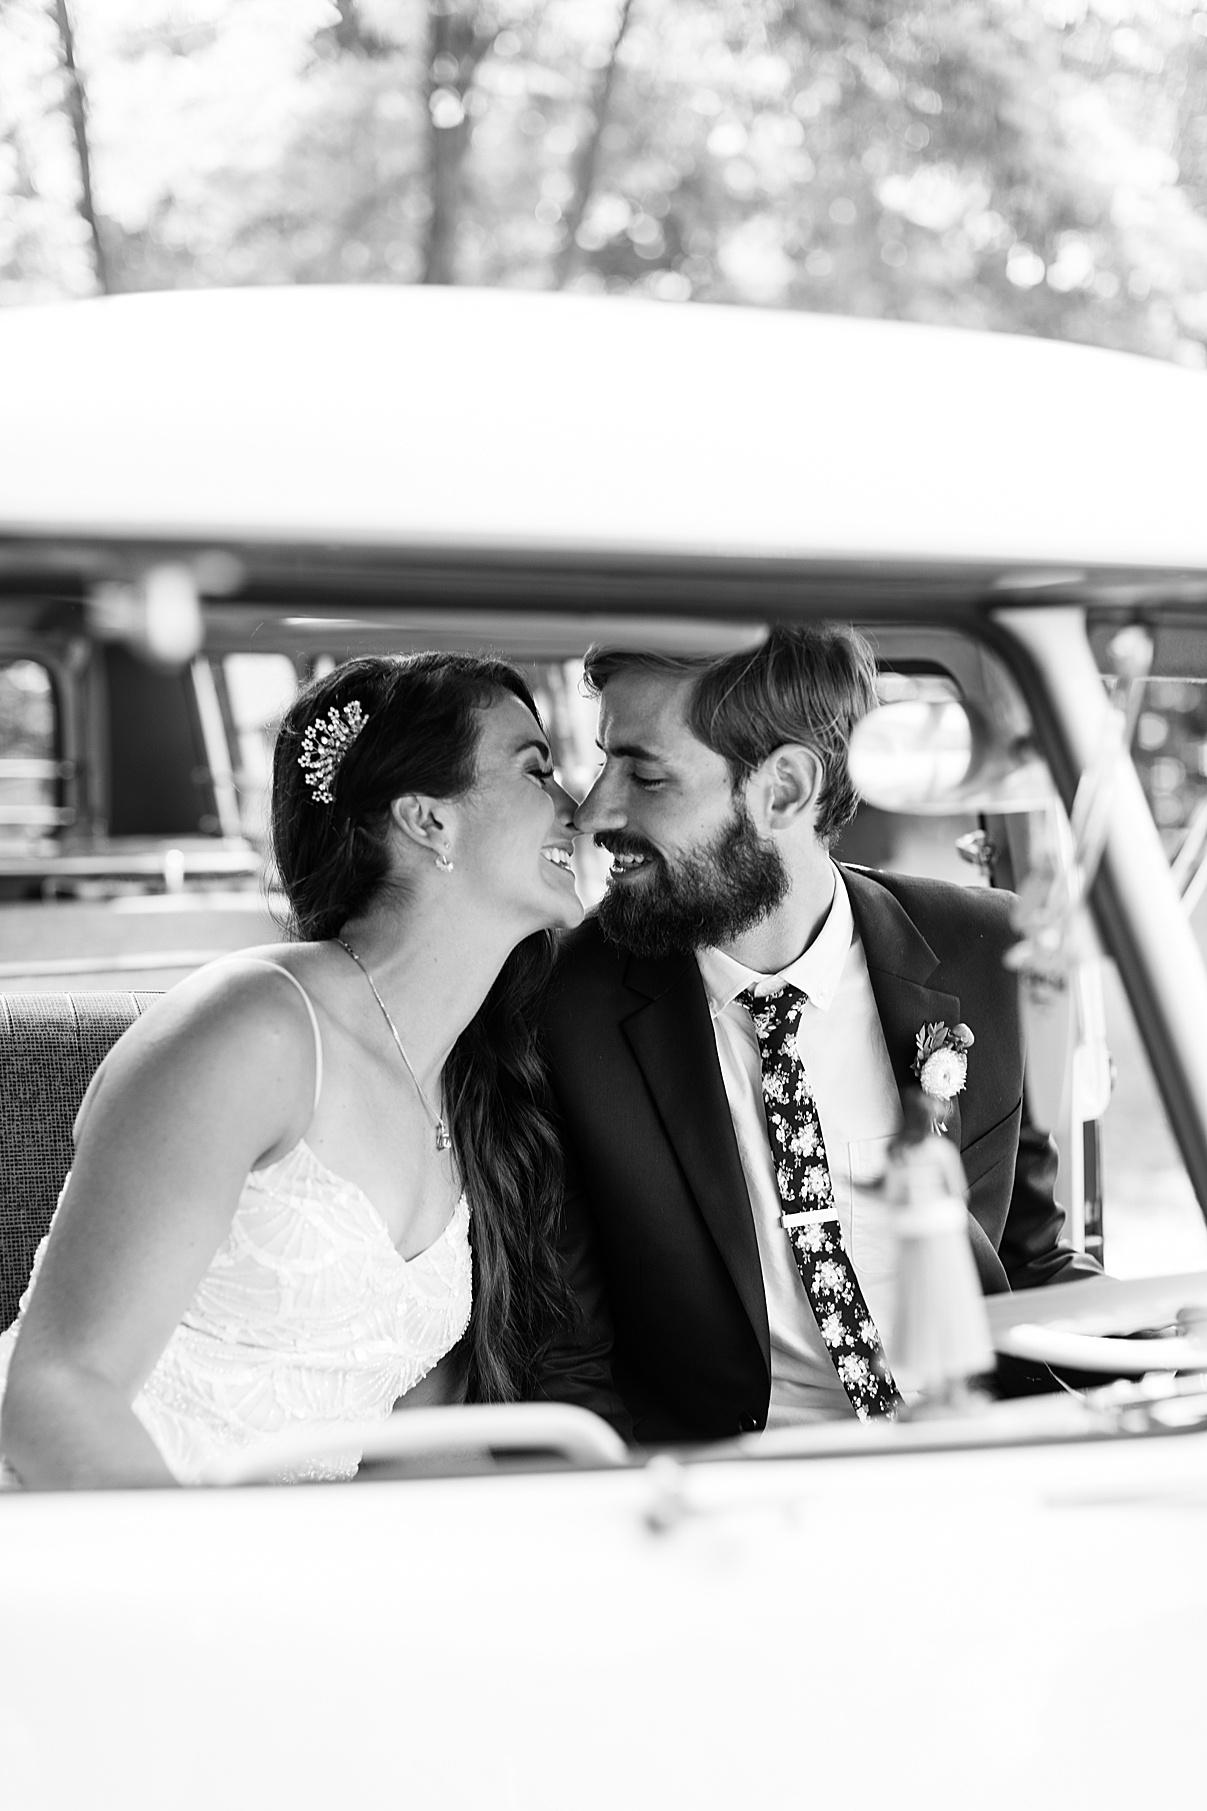 Black and white bride and groom kissing inside vintage bus | Balls Falls, Ontario Wedding| Ontario Wedding Photographer| Toronto Wedding Photographer| 3Photography| 3photography.ca